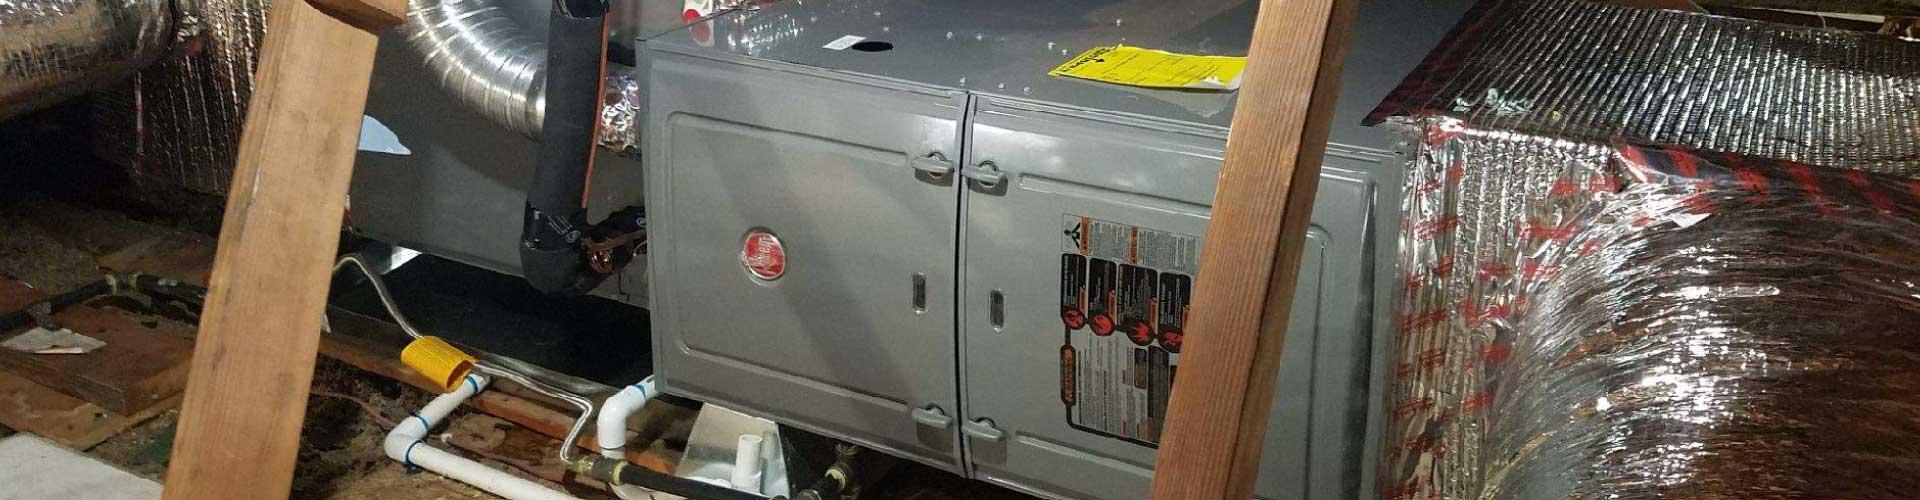 Rheem horizontal furnace installation